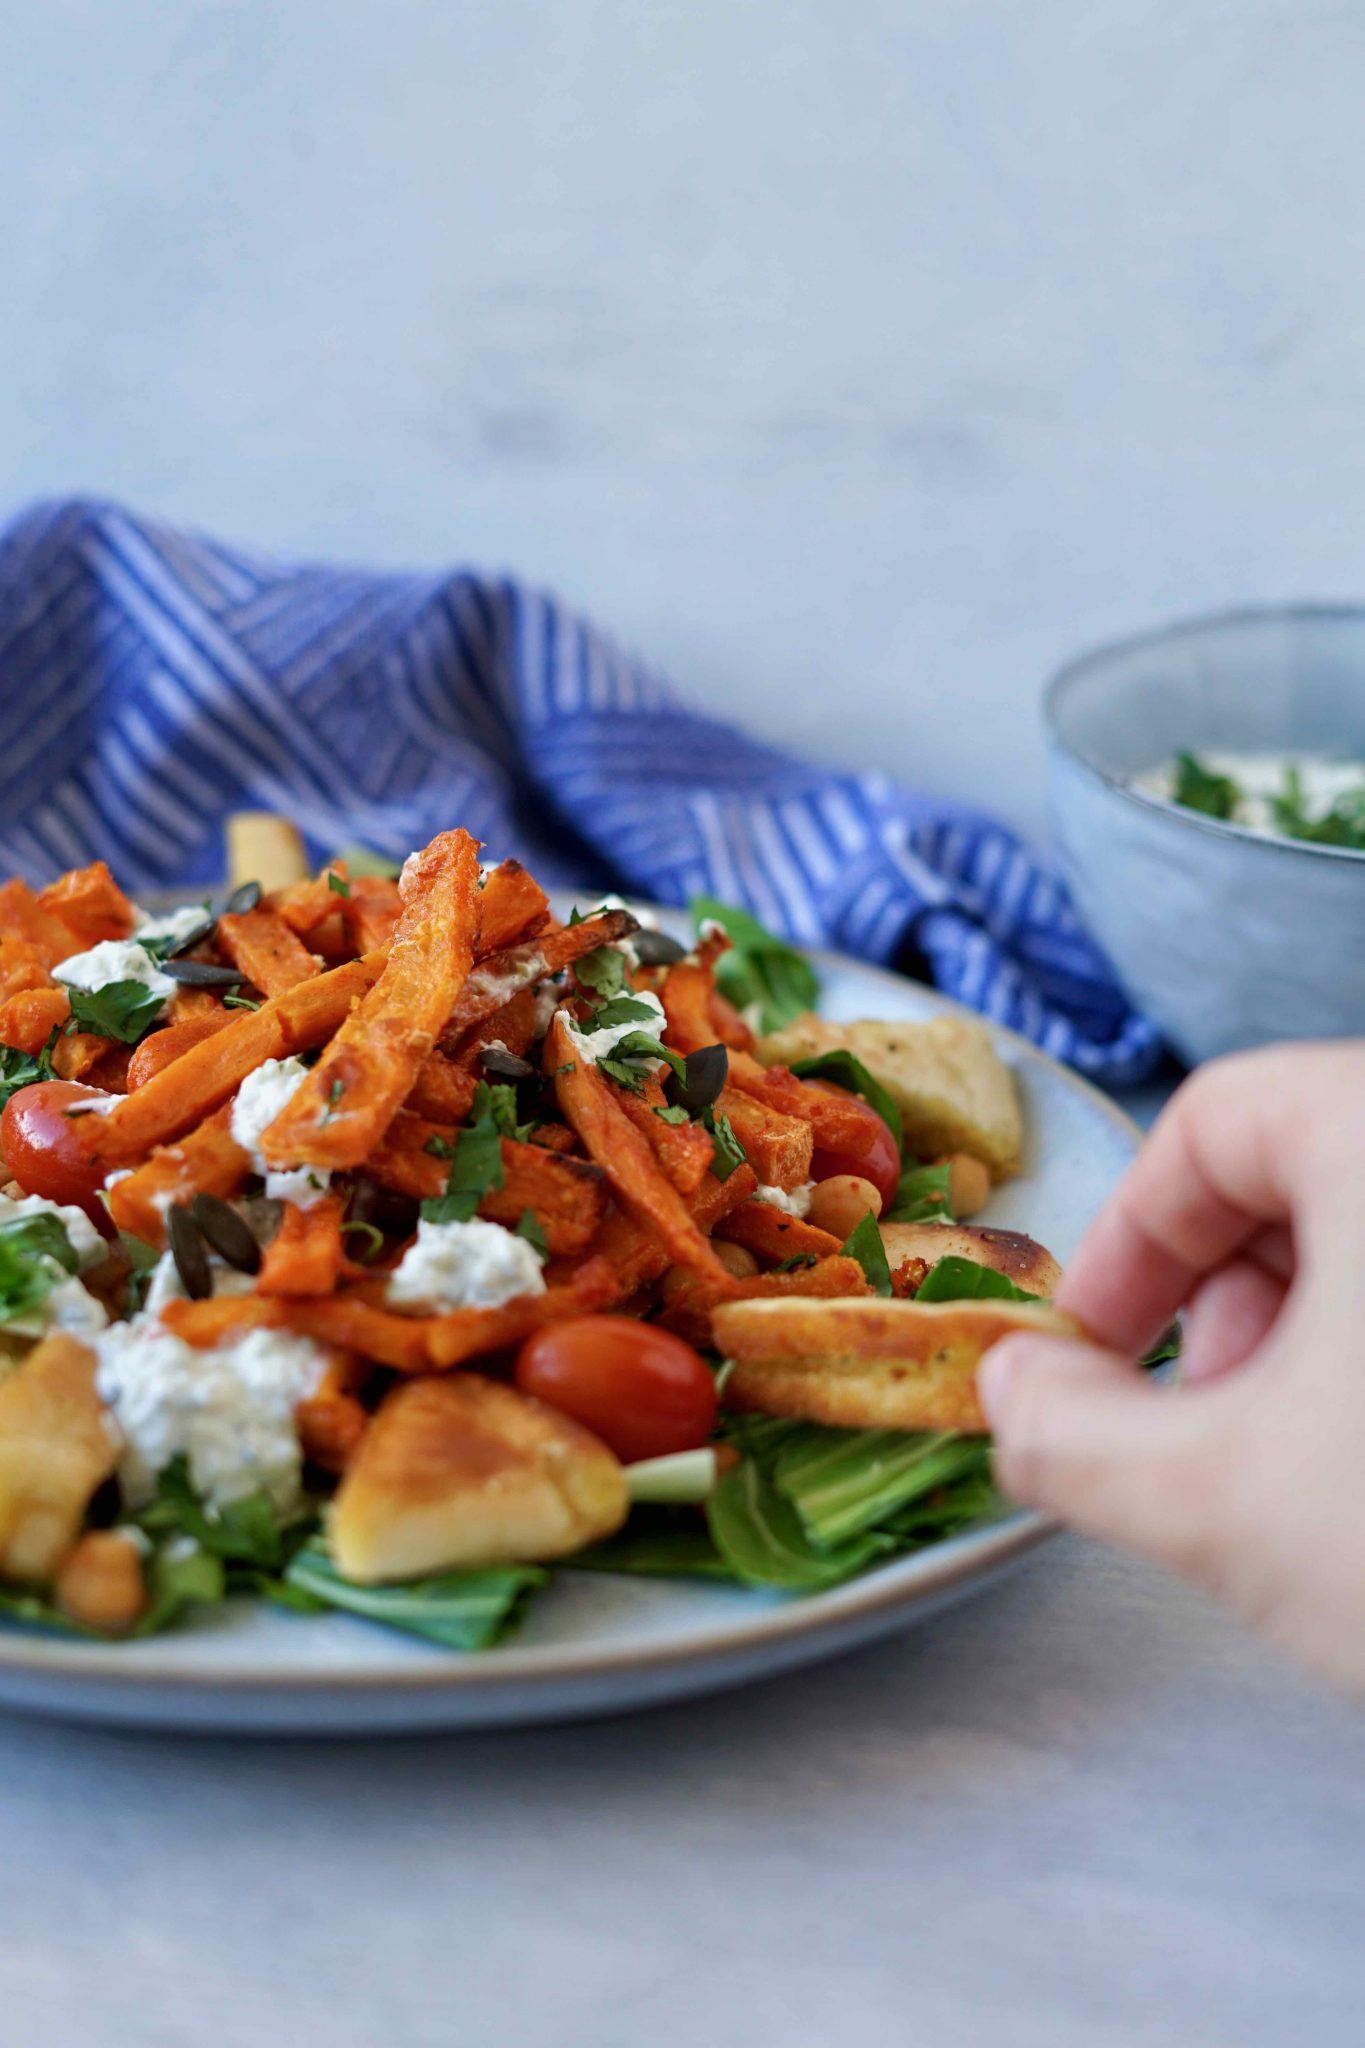 Fries before guys: Süßkartoffel-Pommes Streetfood Style